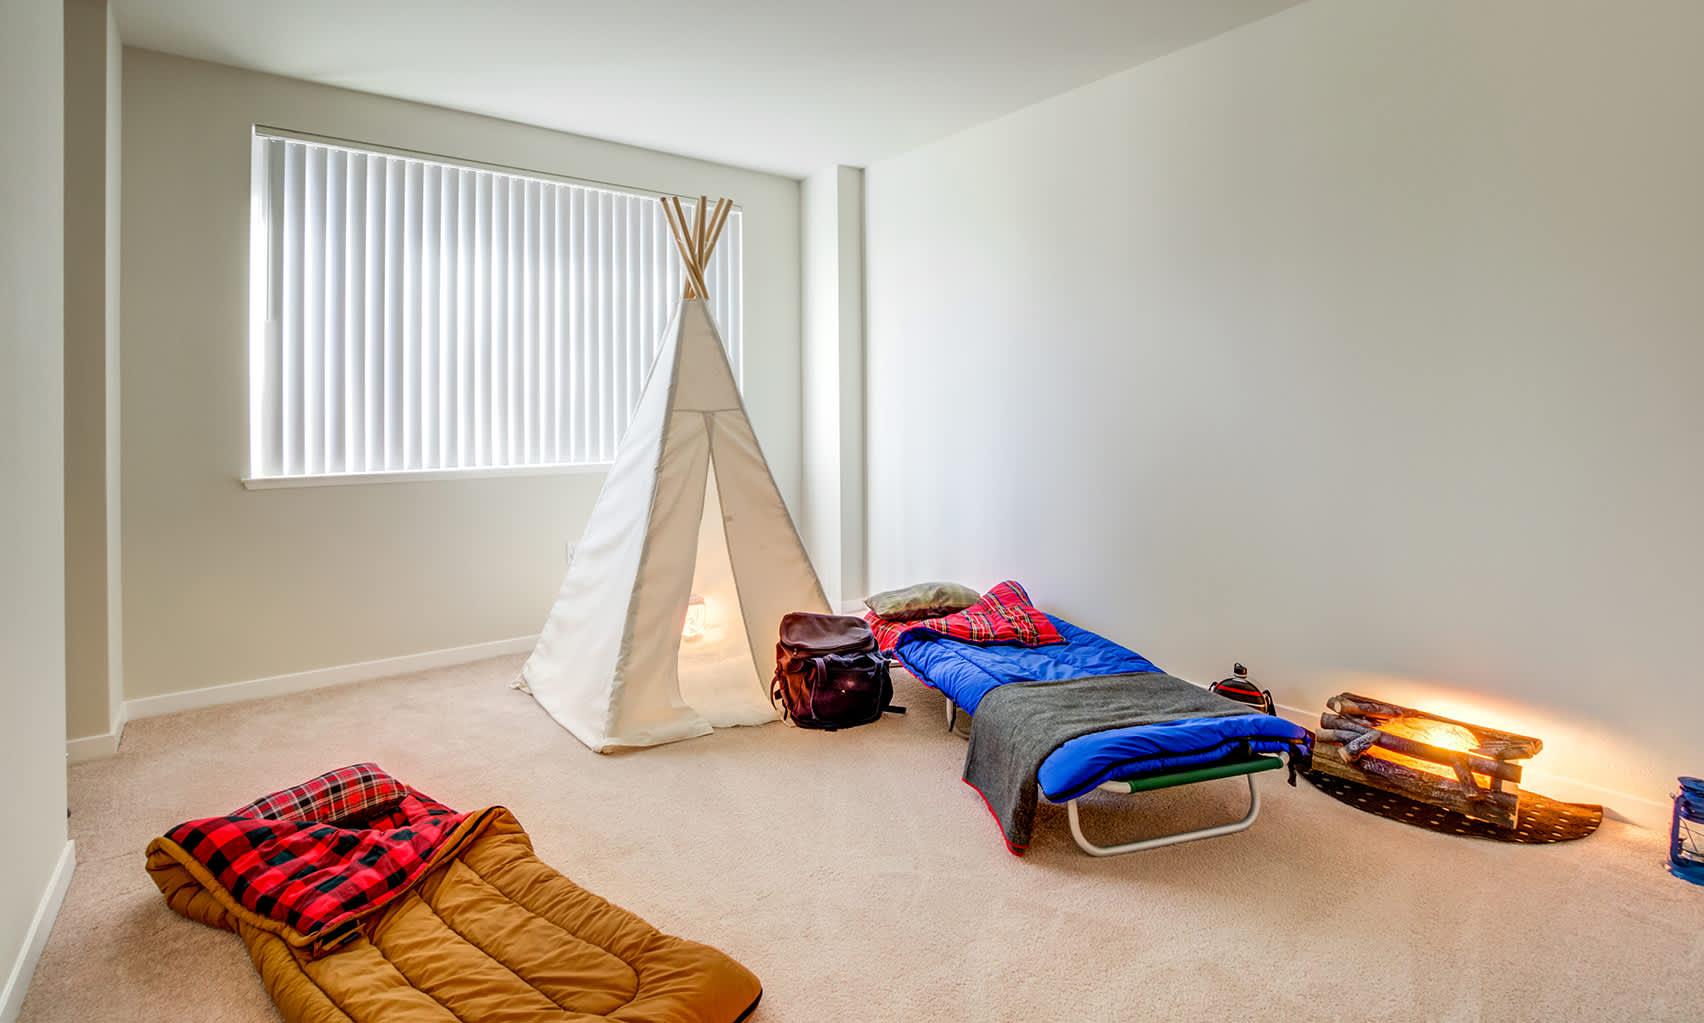 550 Moreland Apartments apartments in Santa Clara CA to rent photo 13